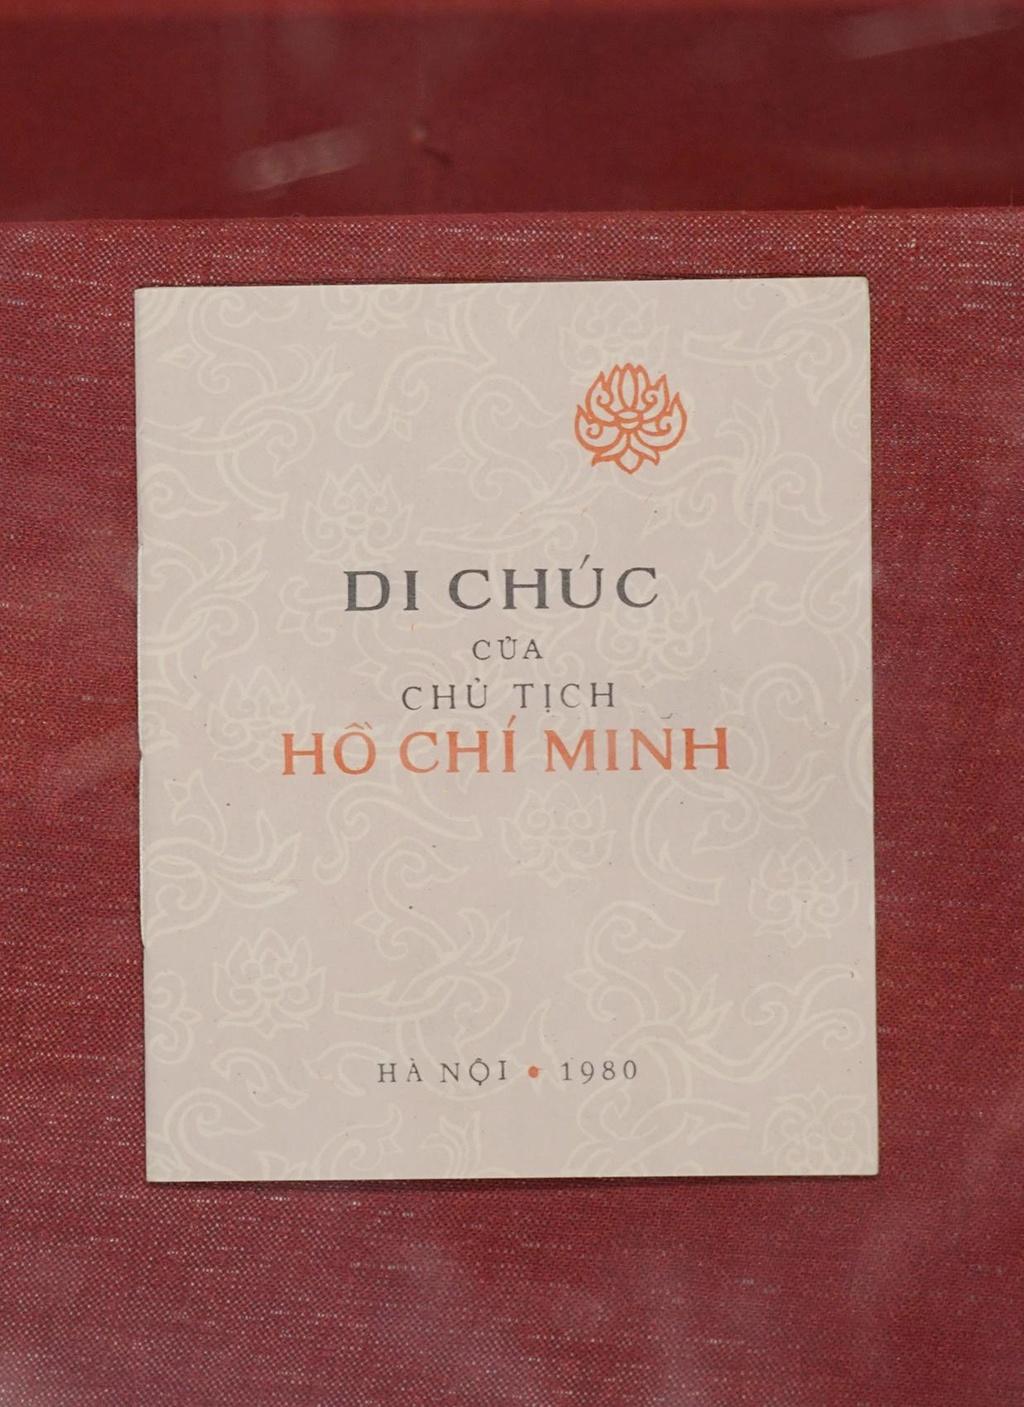 Hoc tap, lam theo Di chuc nam 1969 duoc to chuc nhu the nao? hinh anh 2